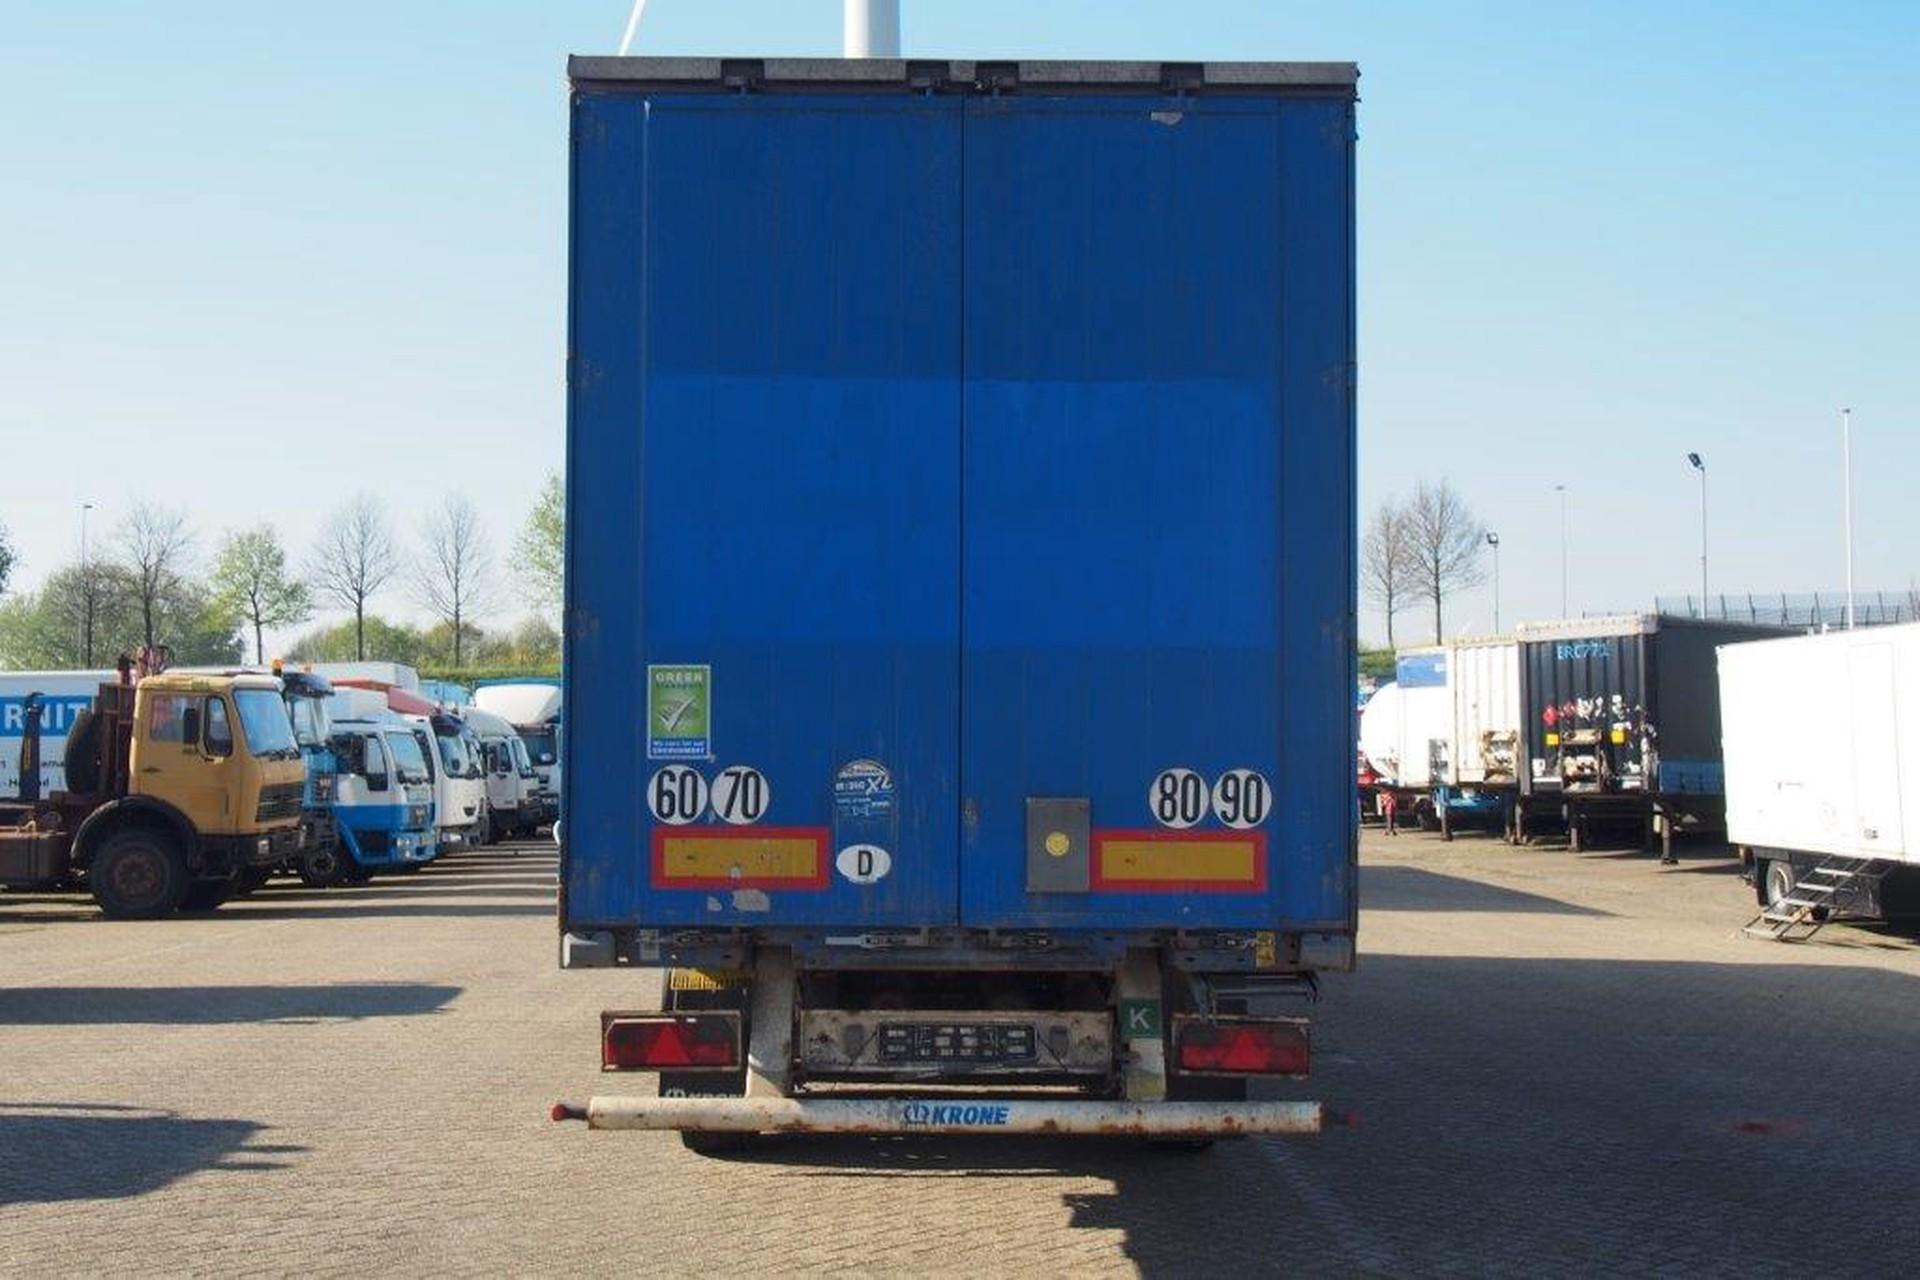 Krone SDP27 Profi Liner, Rong Posts, Huckepack, Ferry hooks